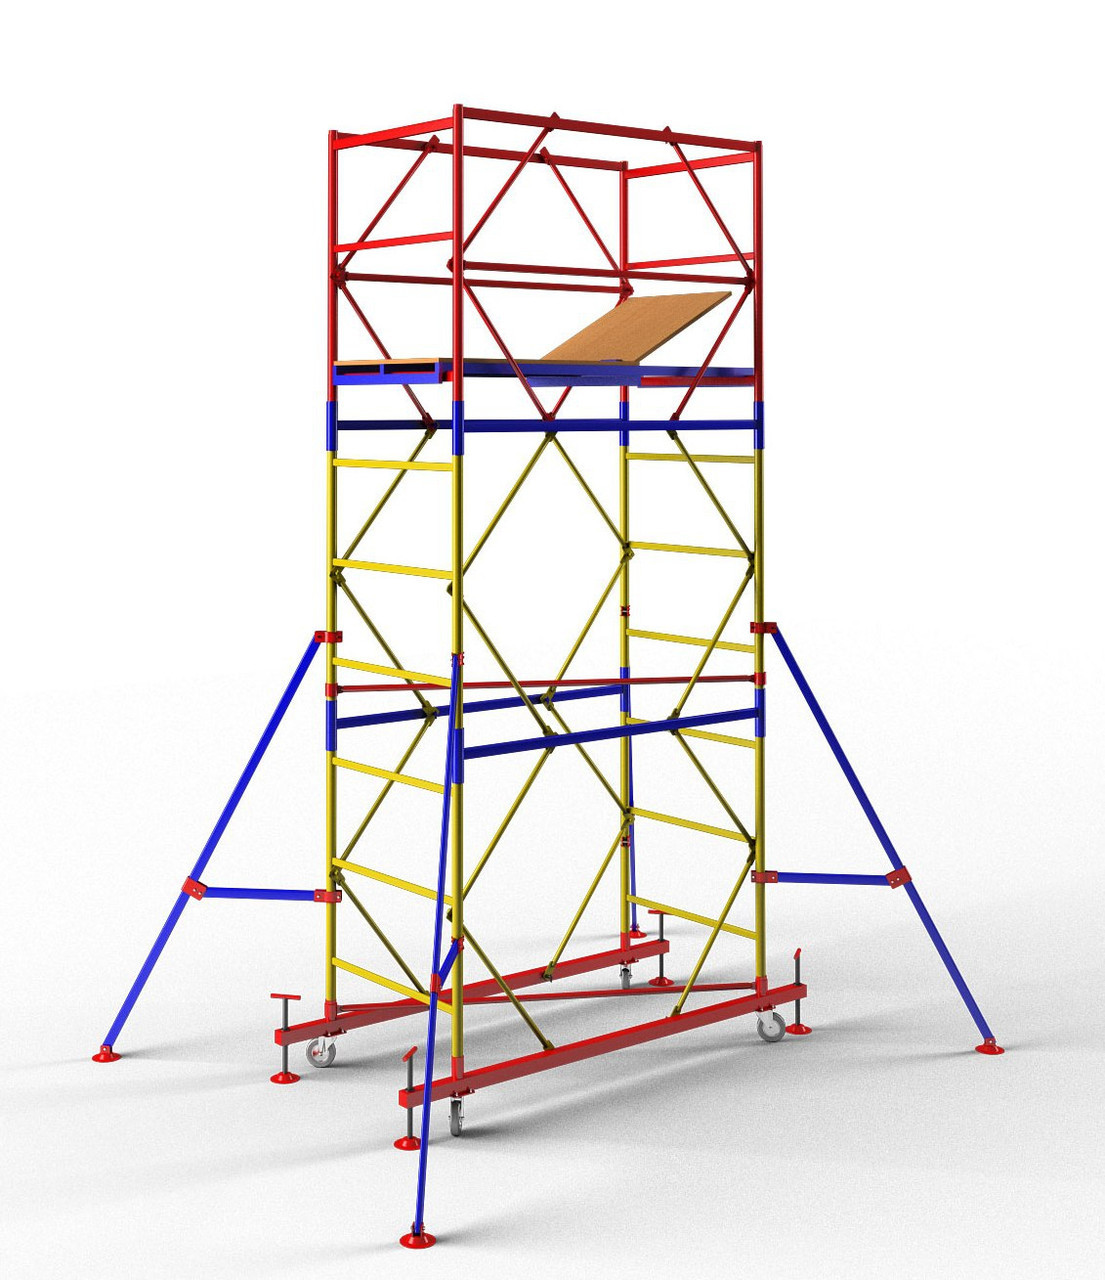 Вышка-тура мобильная облегченная 1,2 х 2,0 м (9+1) Раб.высота 13,4 м